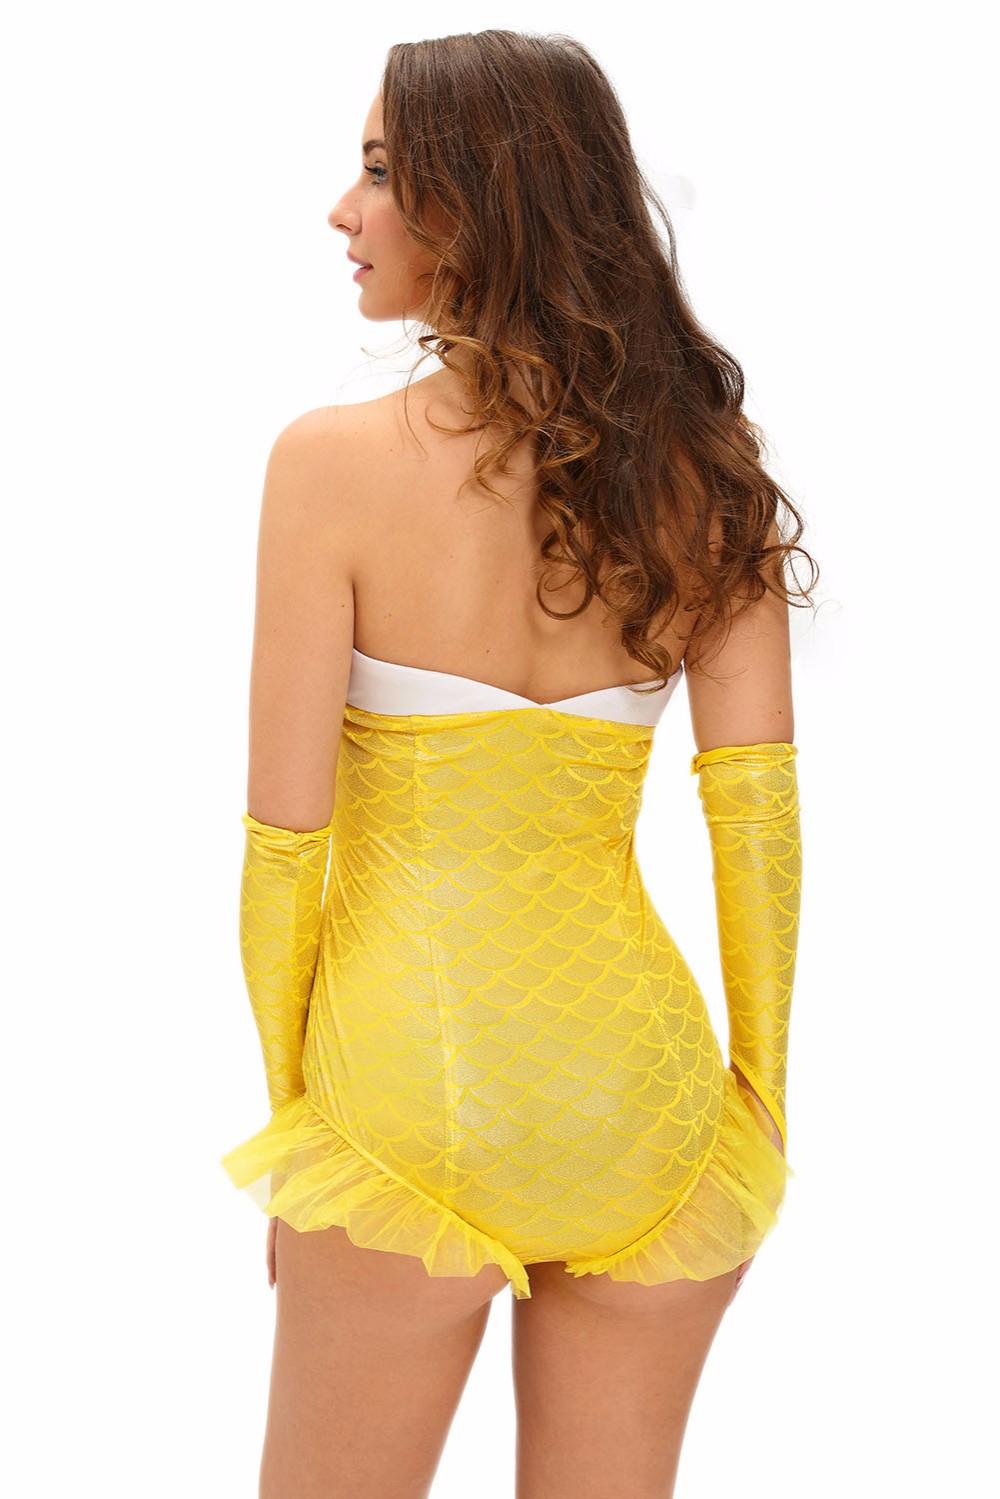 Sexy-Glittering-Mermaid-Romper-Costume-LC89001-7-5